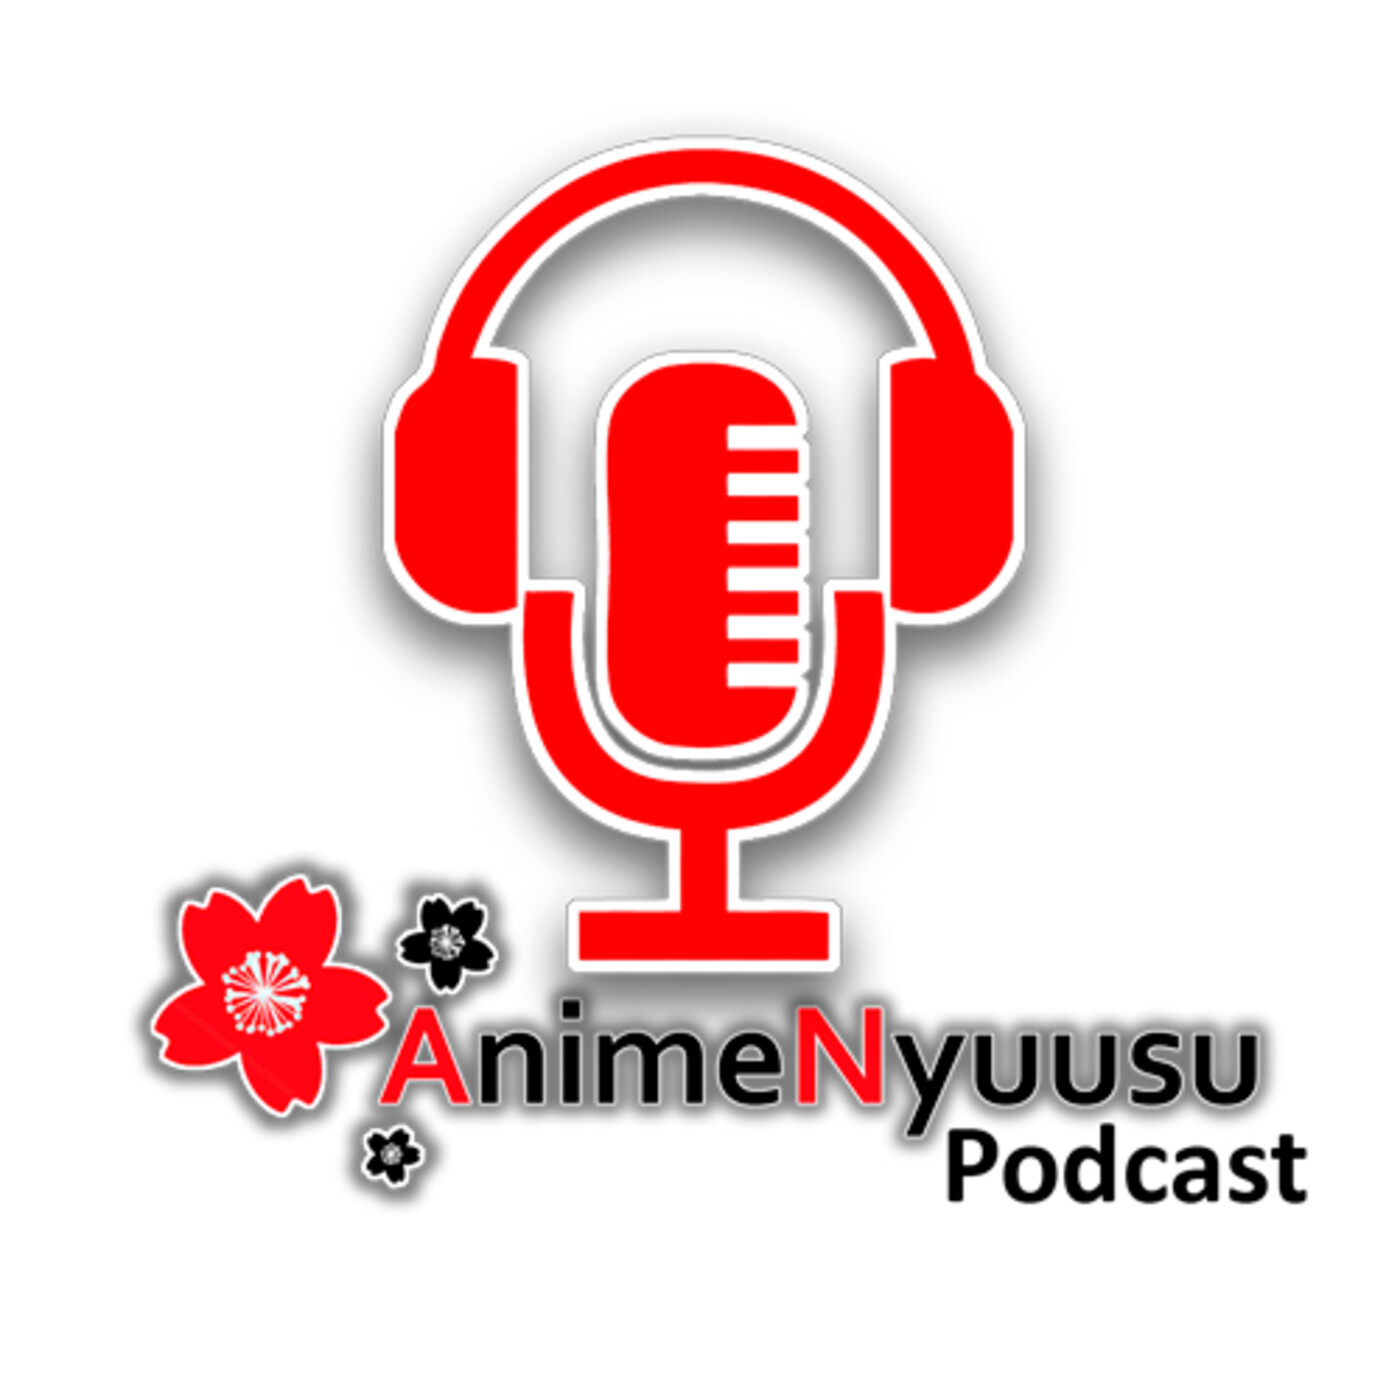 El rincón del friky - Podcast 2